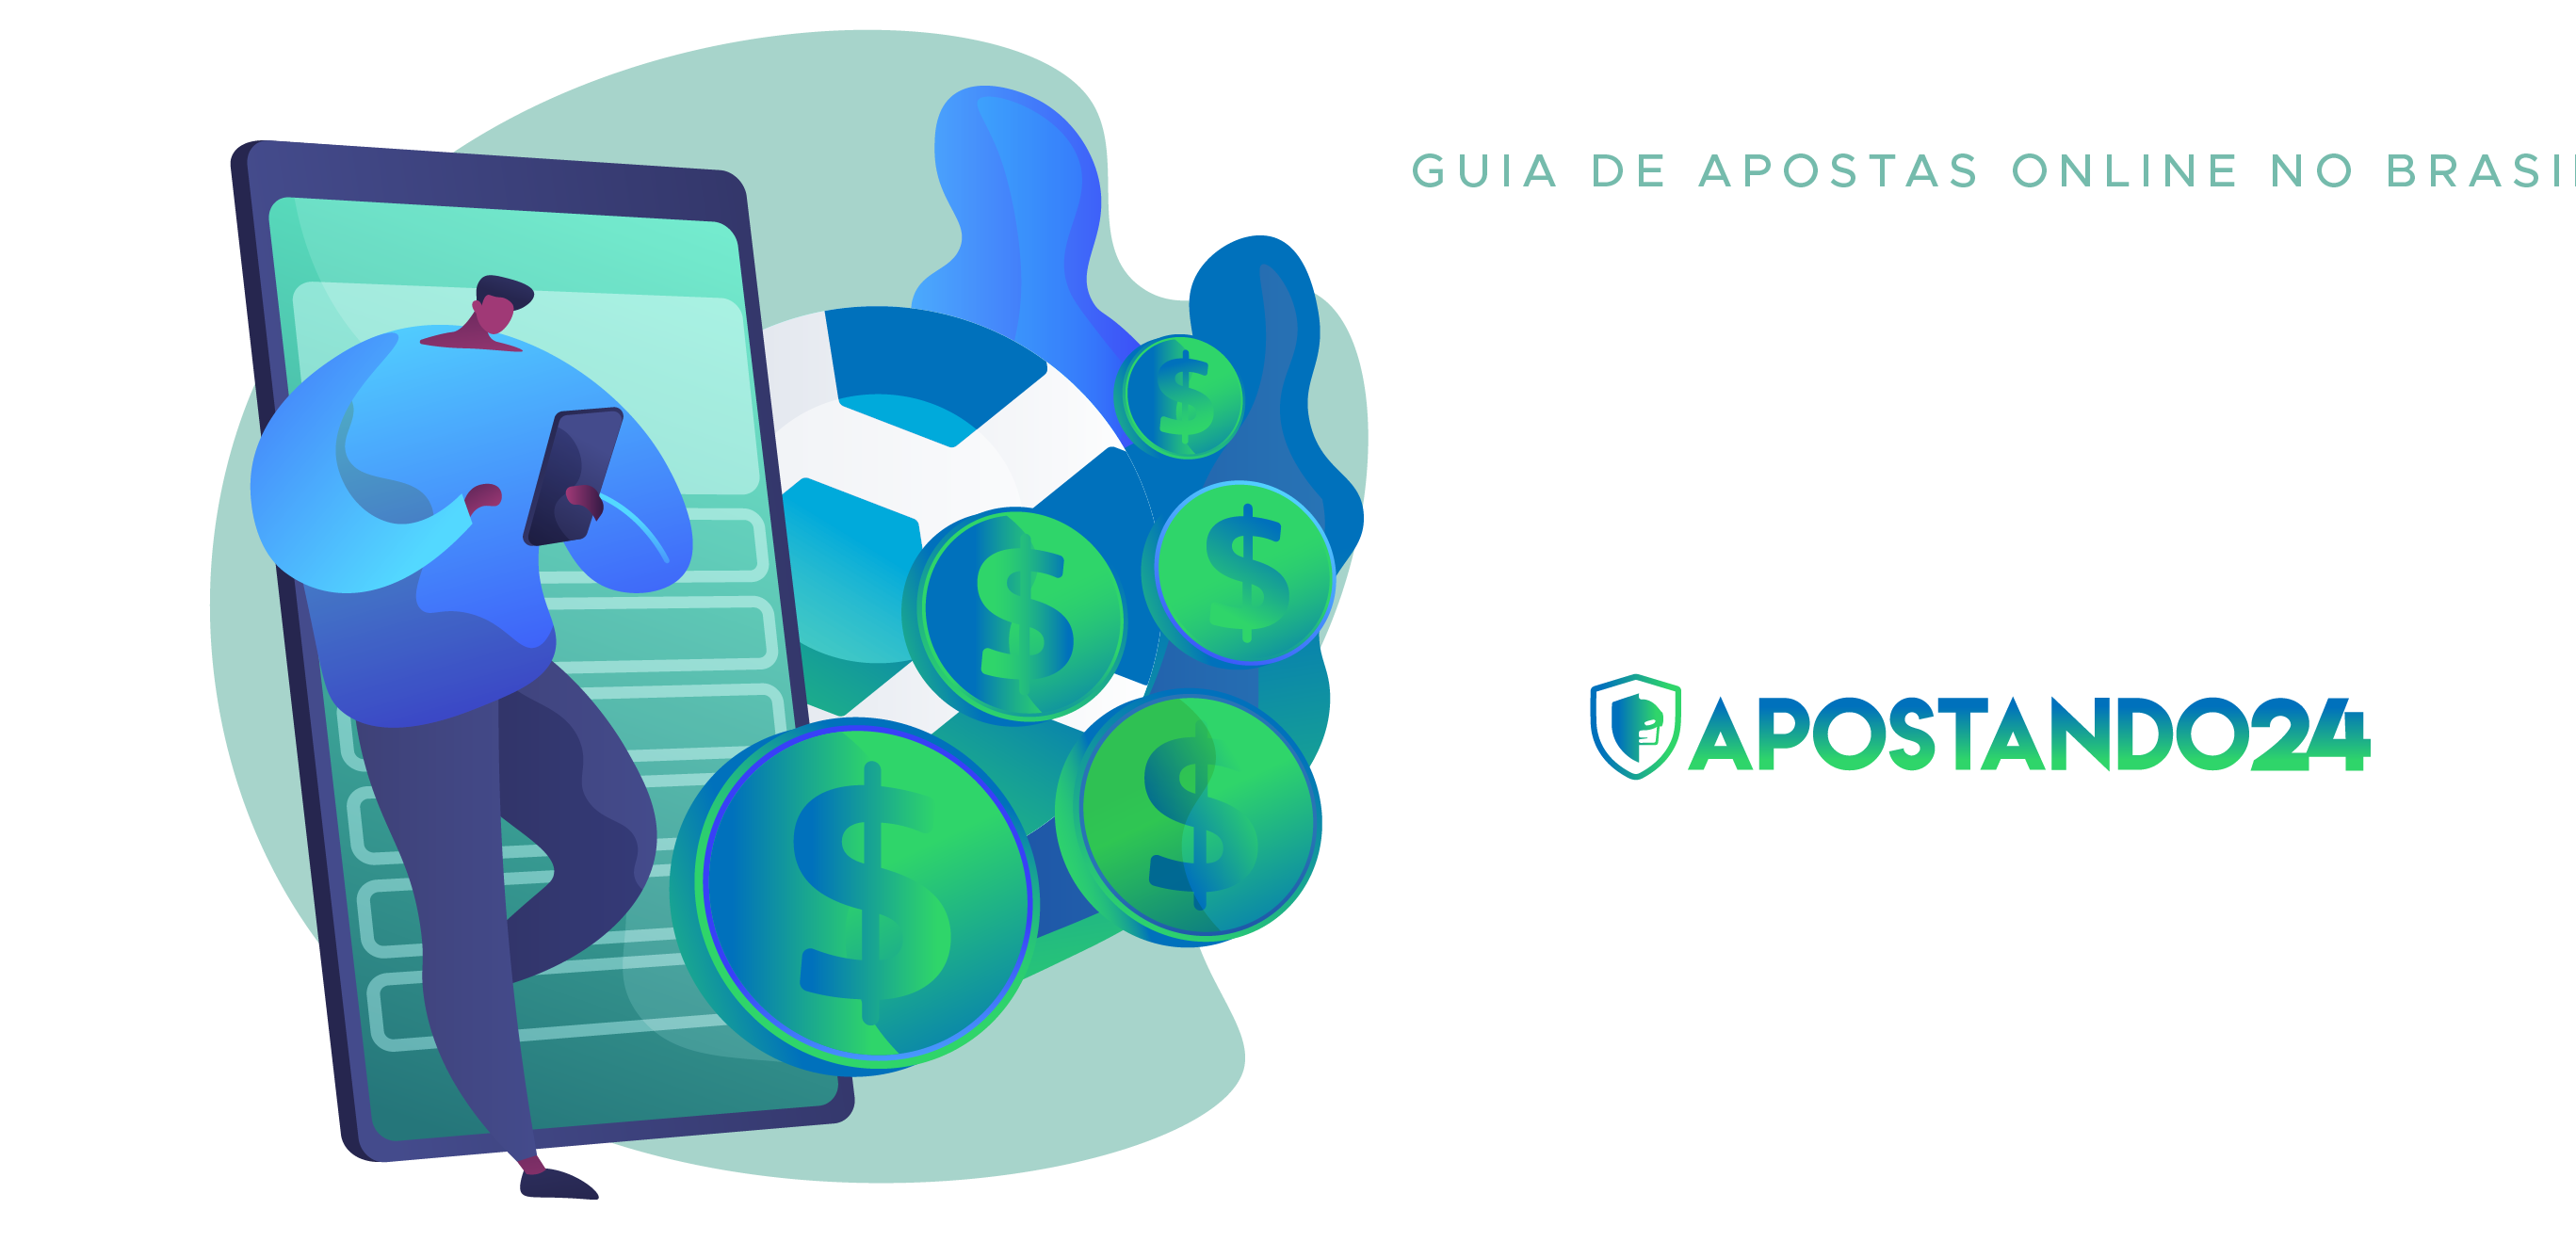 Guia de apostas online no Brasil